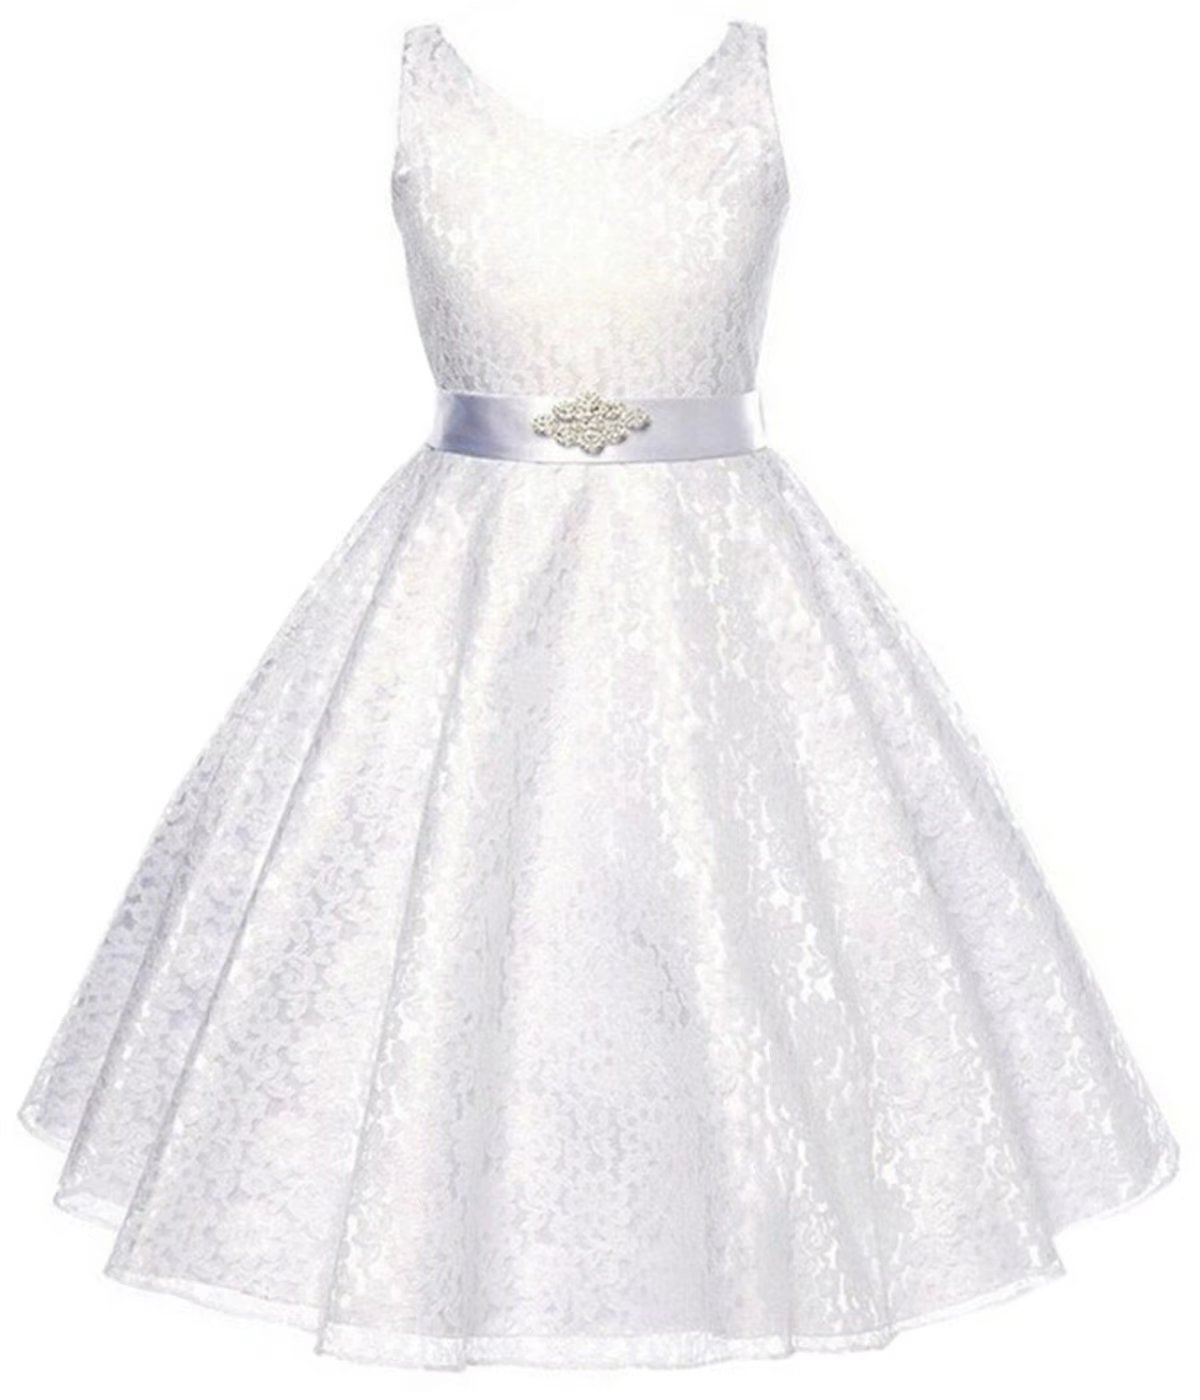 Betusline Girls' Lace Dressy Dress With Belt (2-10 Years)